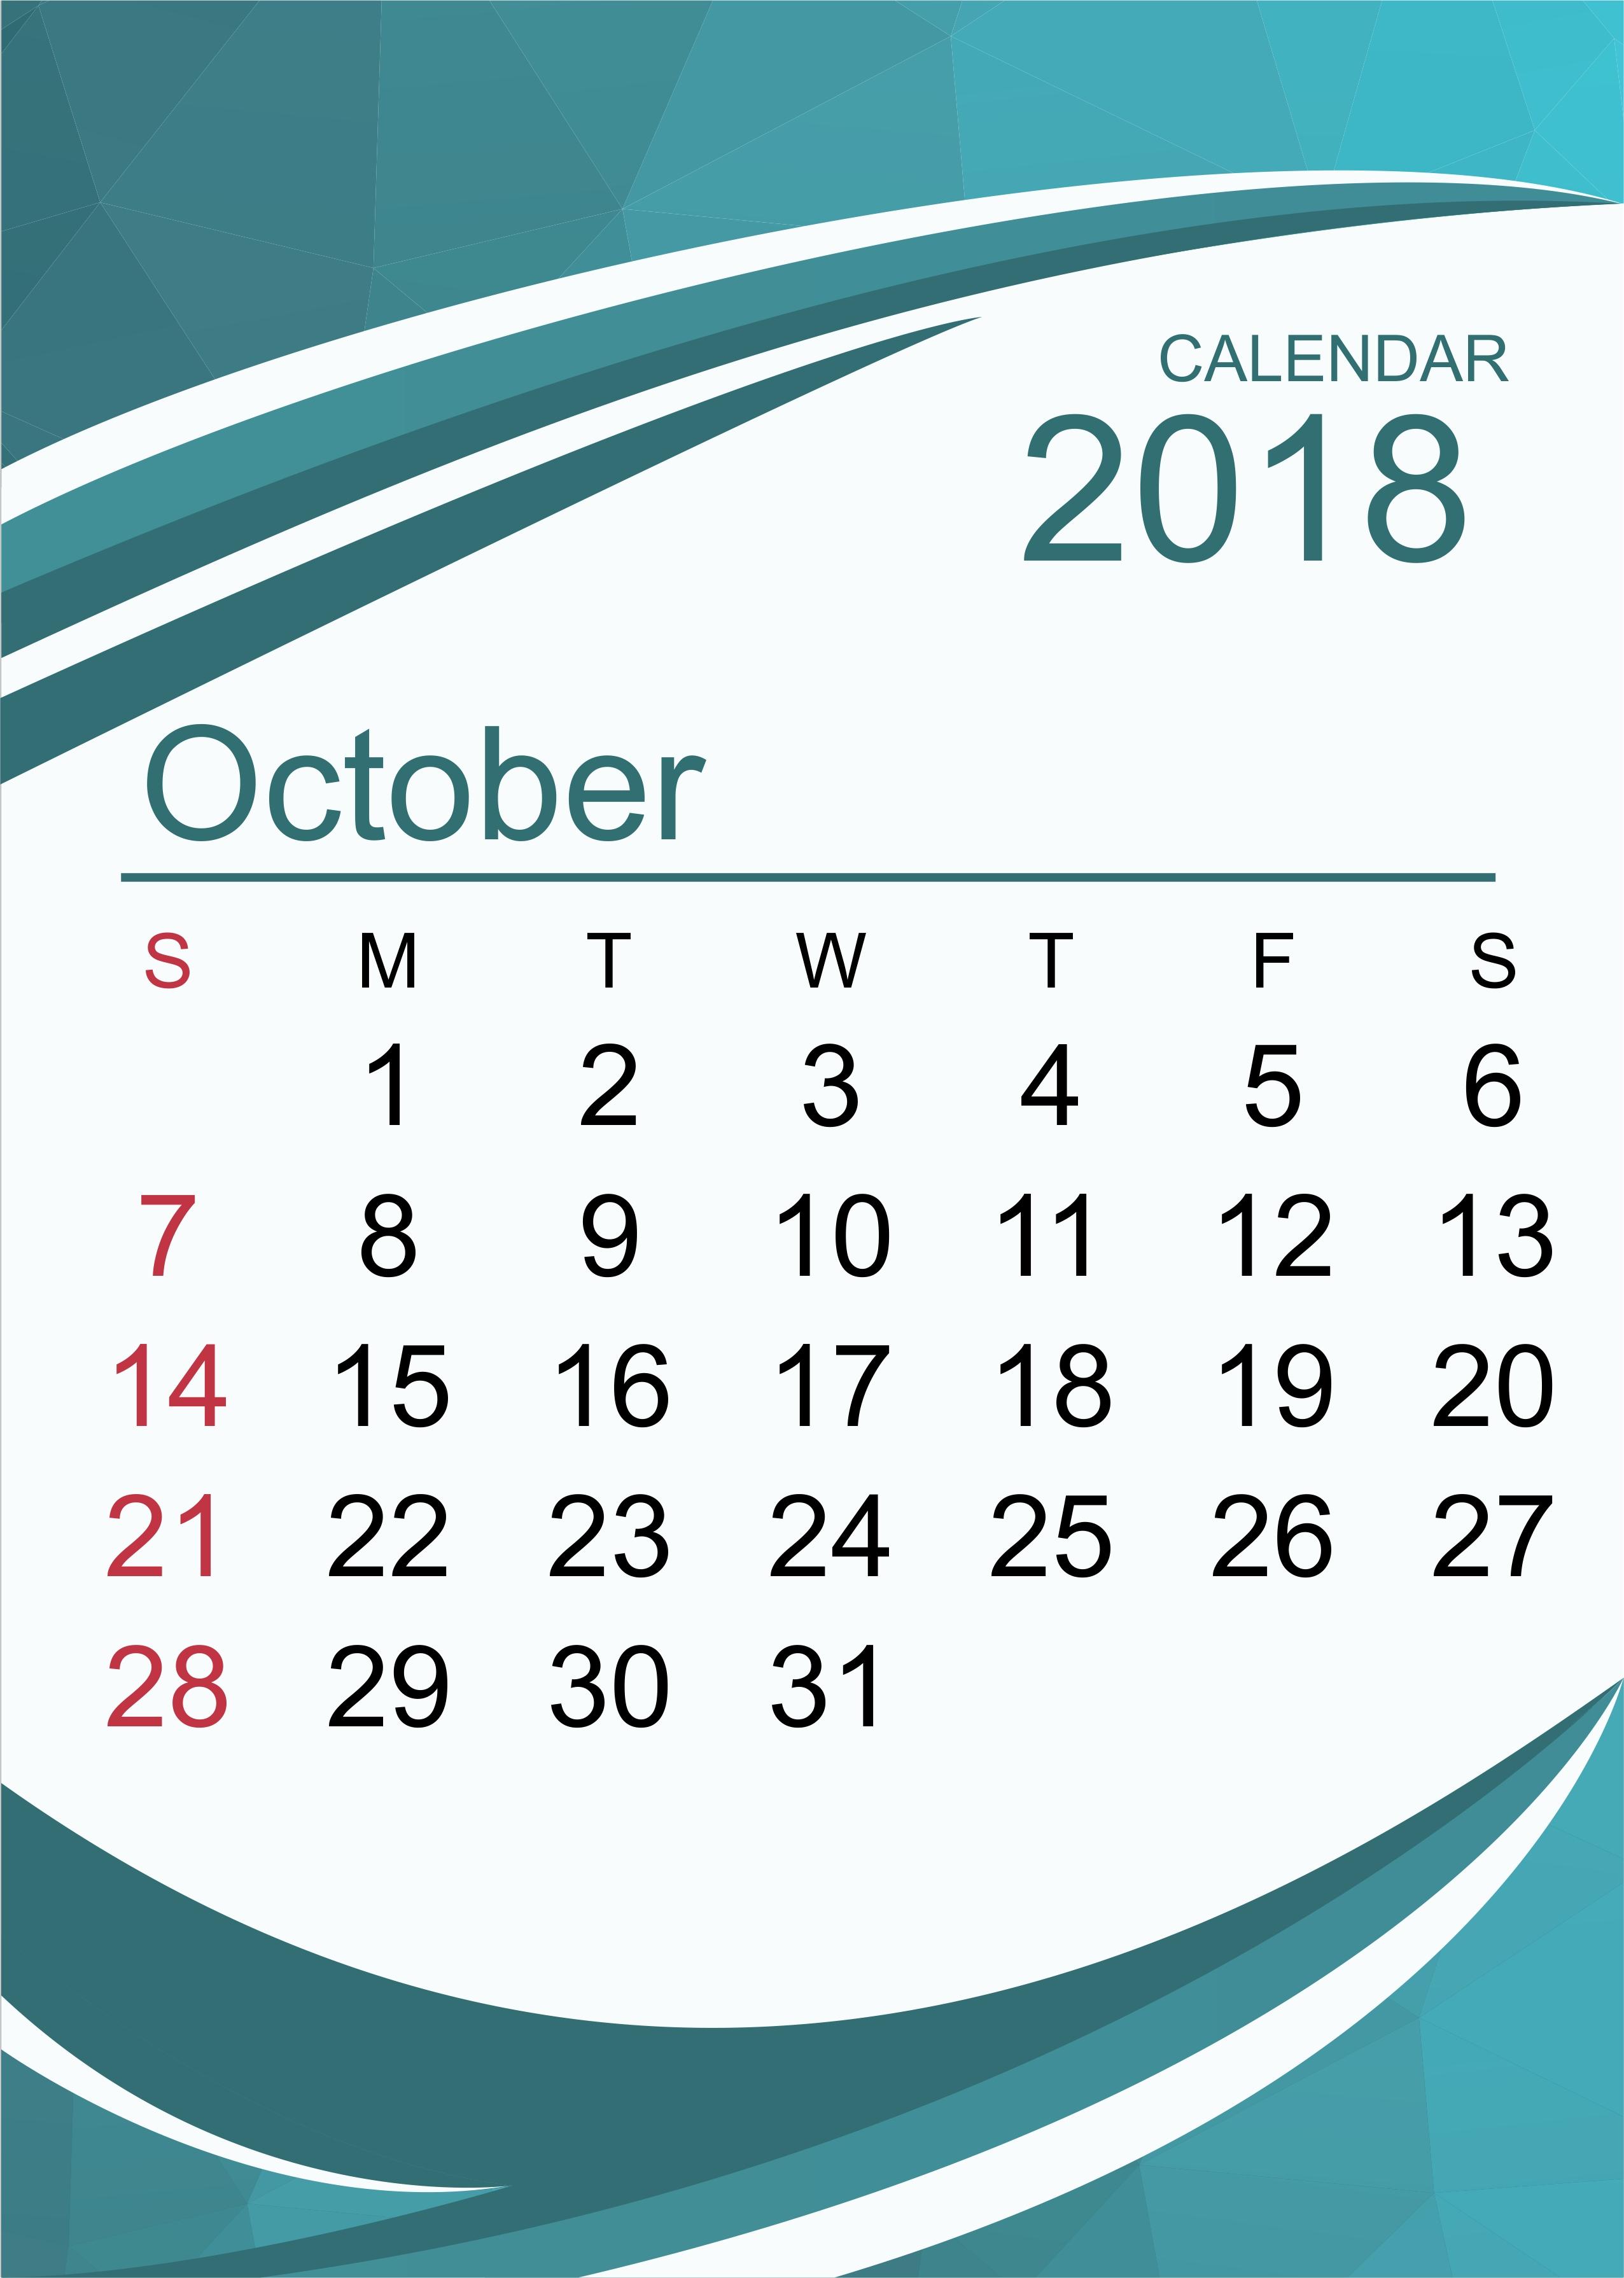 october 2018 calendar october 2018 printable calendar october Calendar October 2018 Printables erdferdf